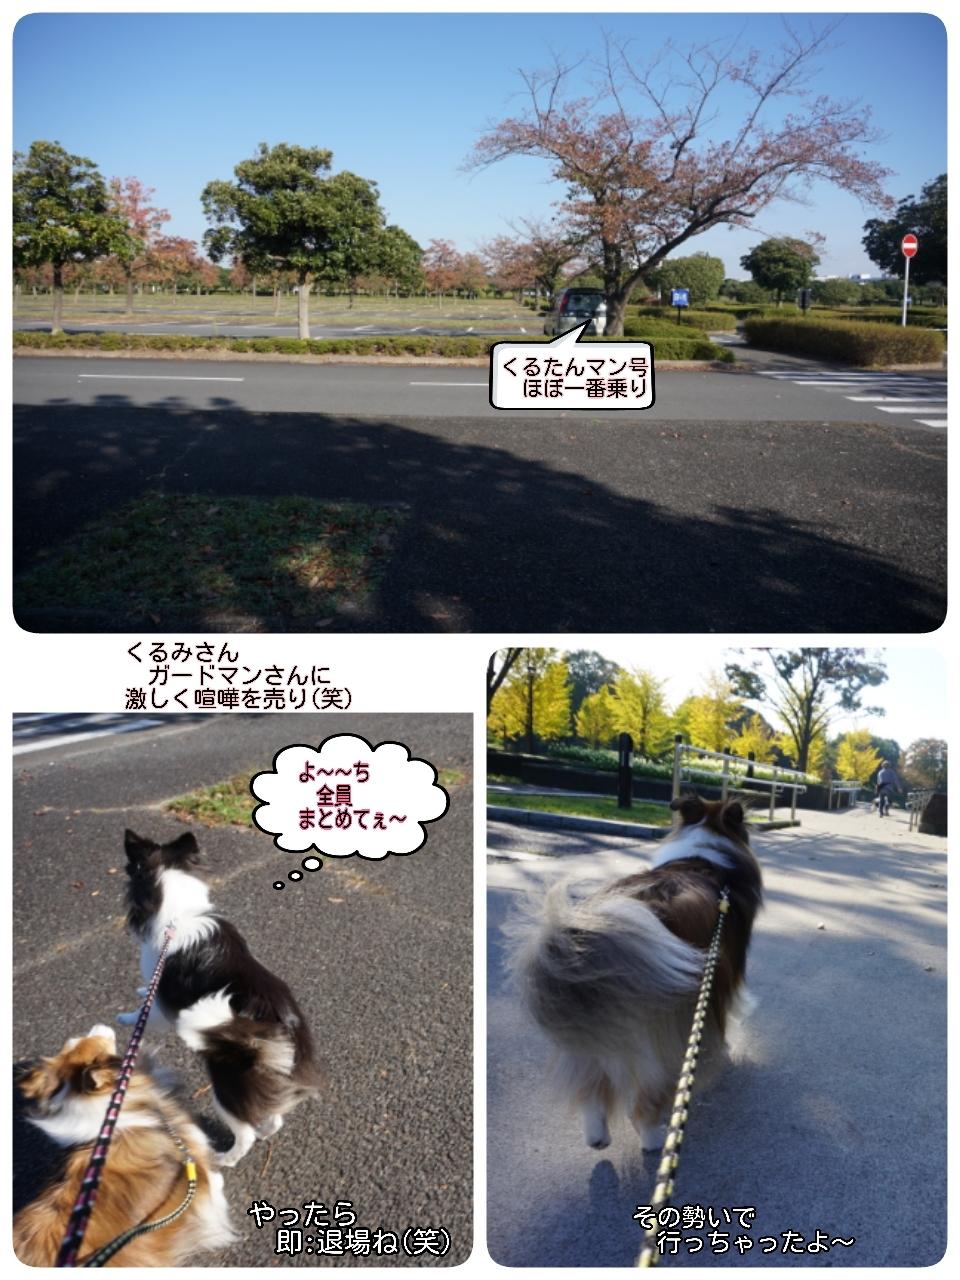 16-11-05-18-09-55-296_deco.jpg